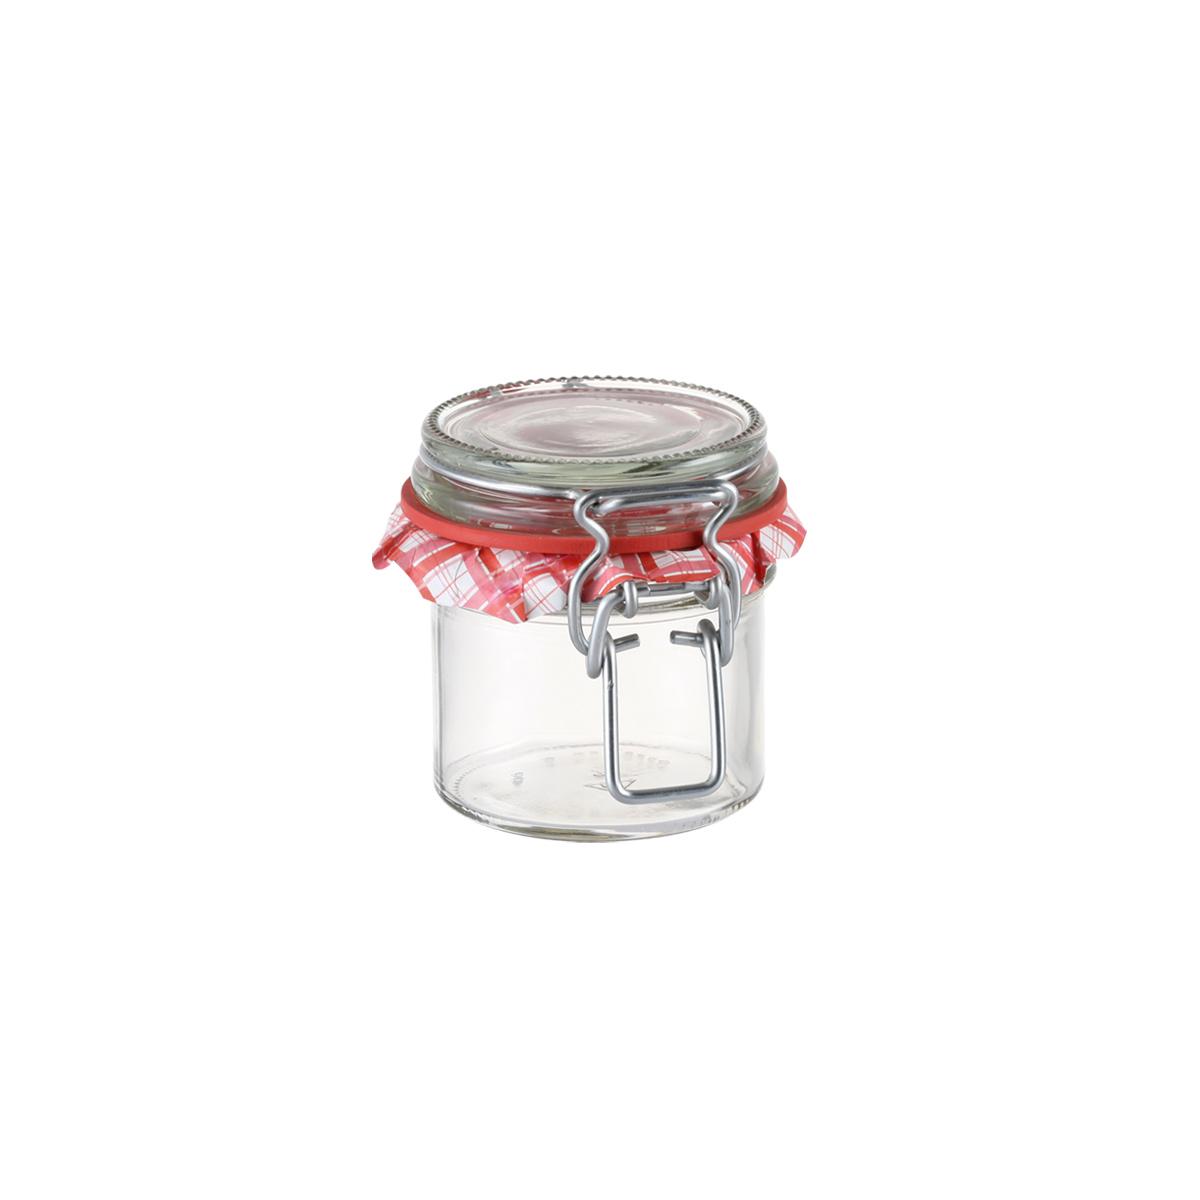 Zavařovací sklenice s klipem TESCOMA DELLA CASA 100 ml